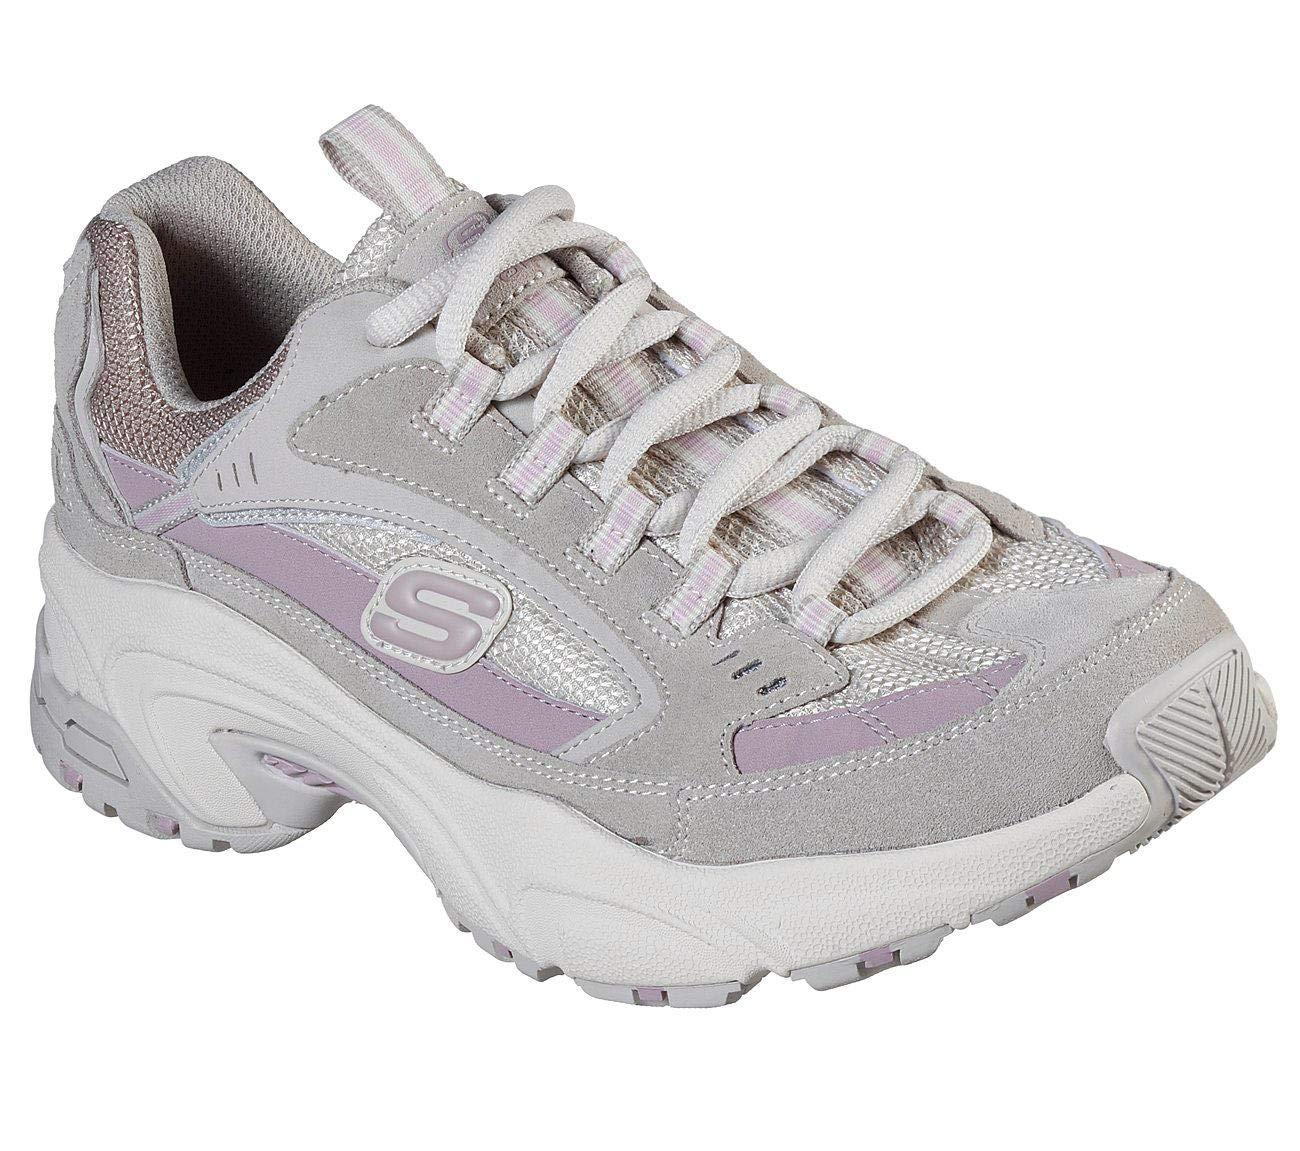 Skechers 斯凯奇 Stamina 女士运动鞋